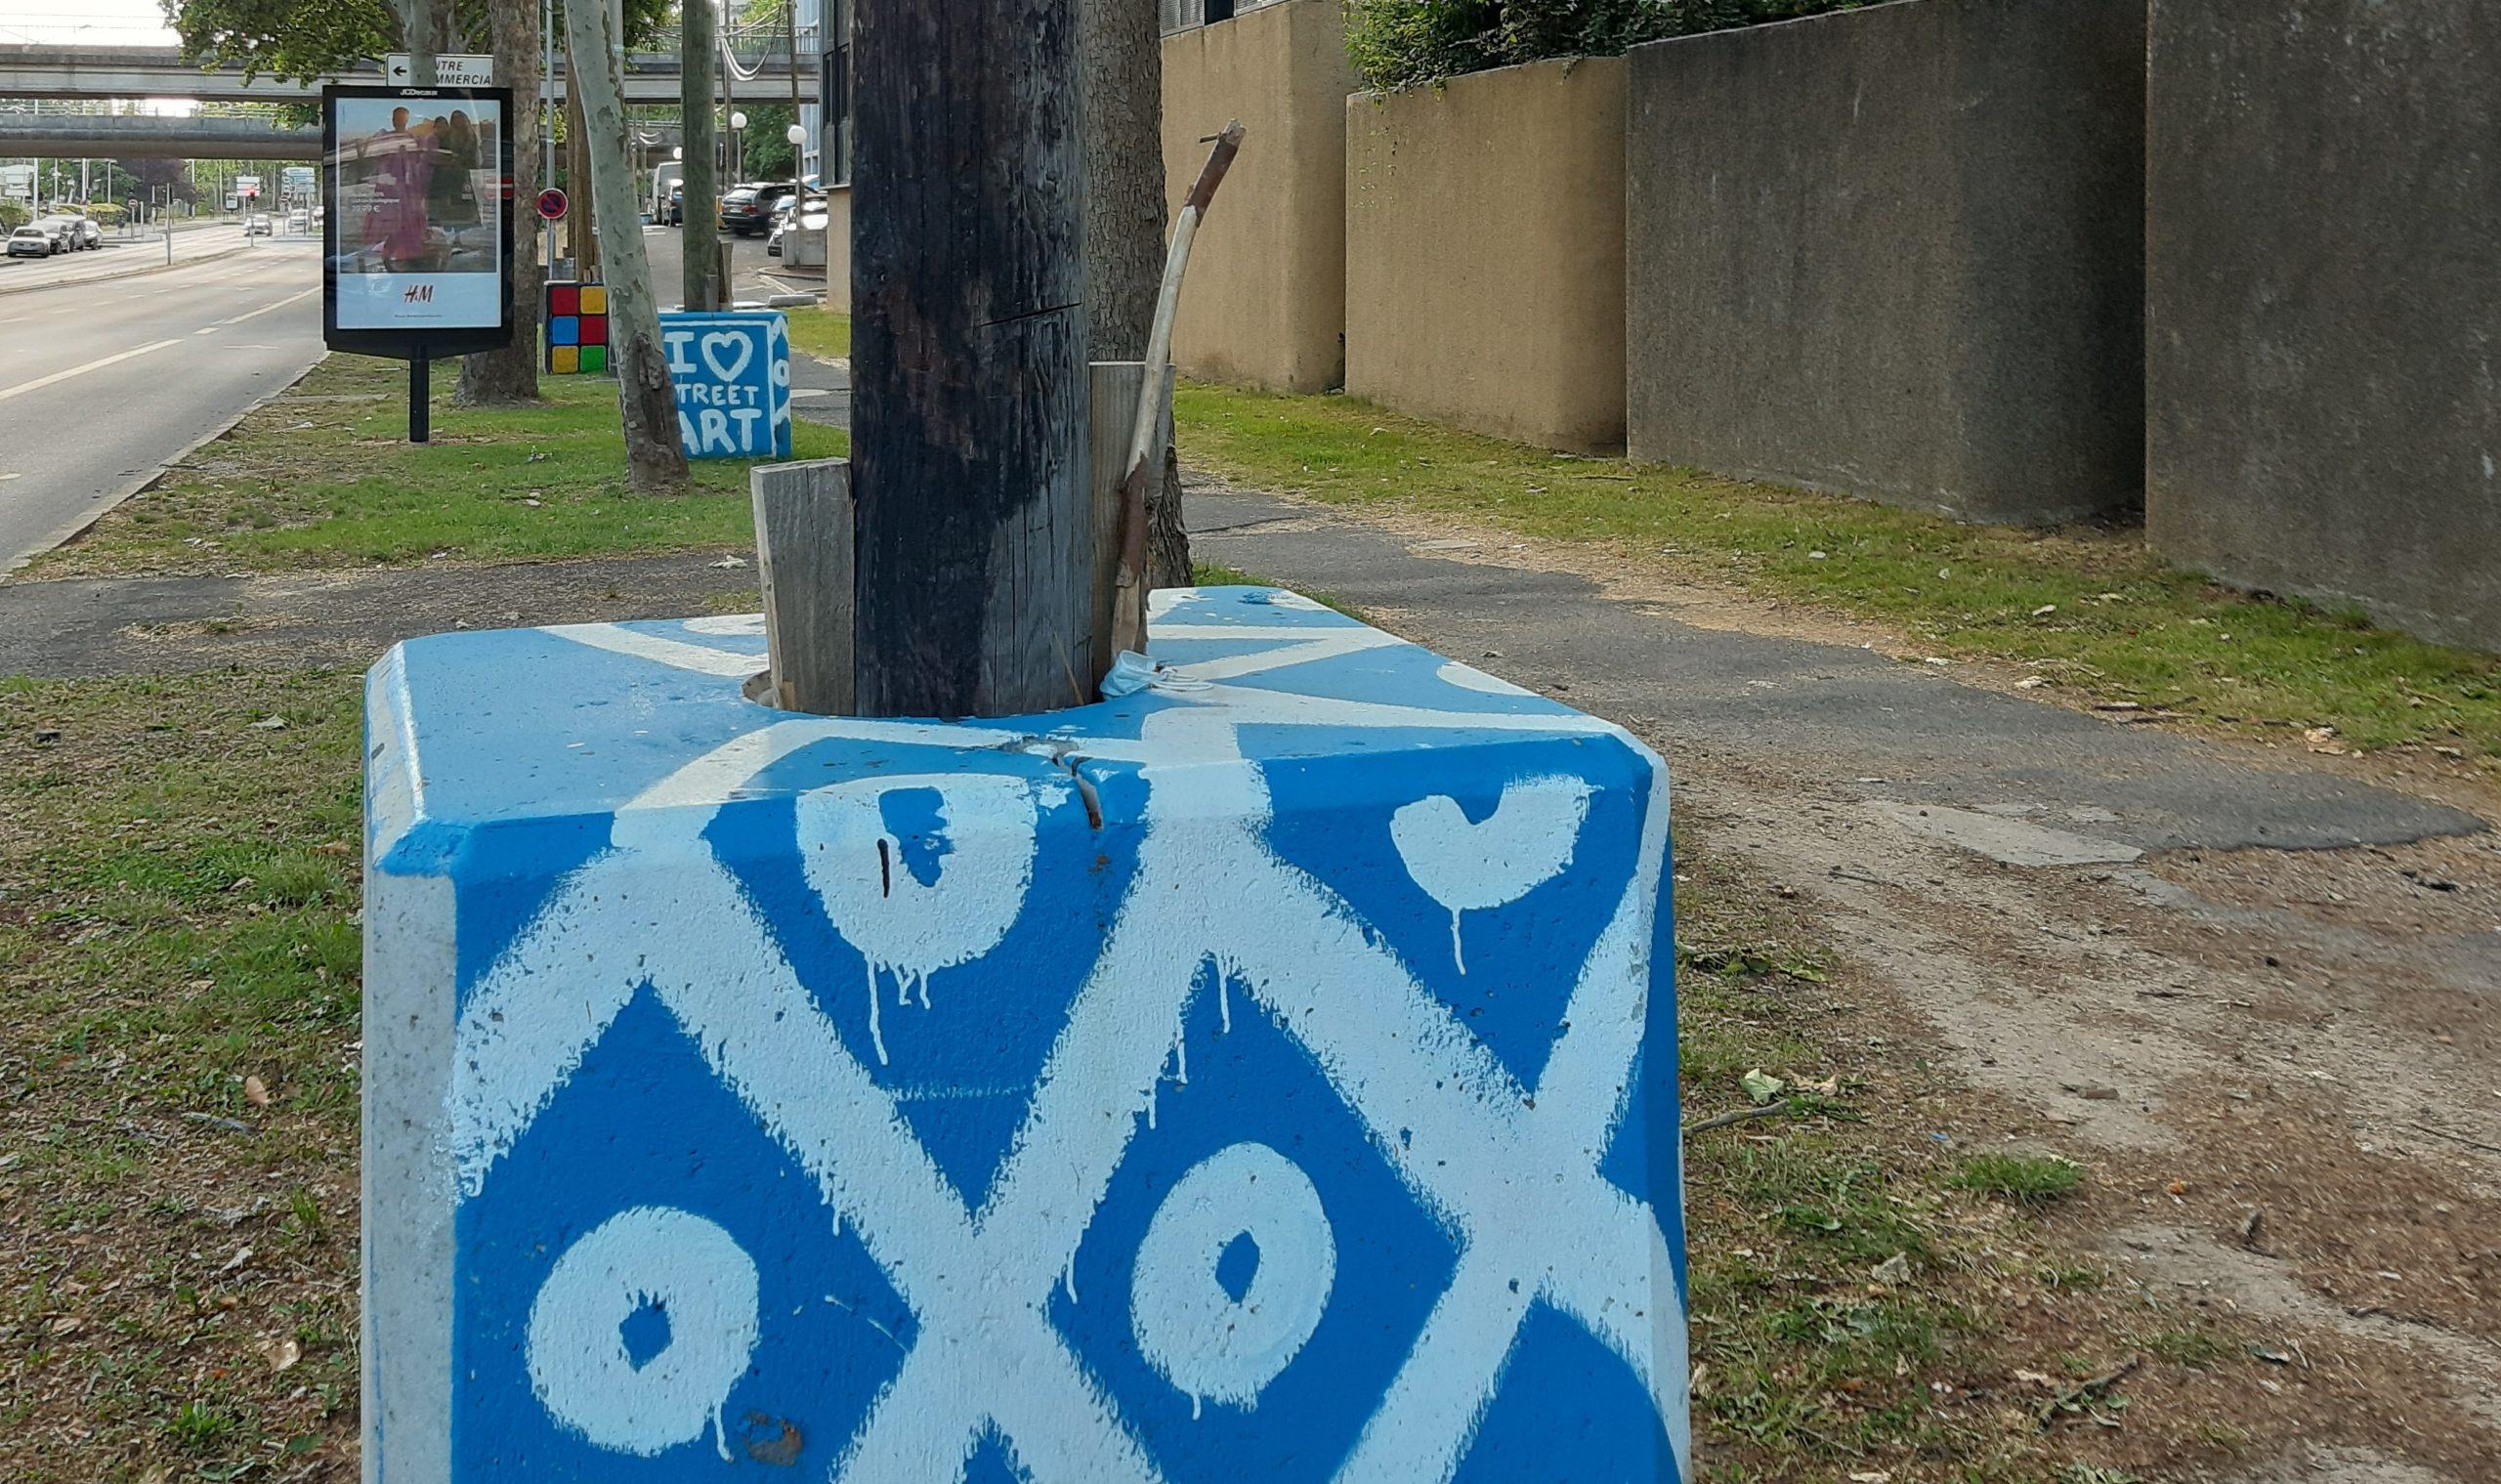 mobilier-urbain-street-art-evry-big-20200609_191901-2